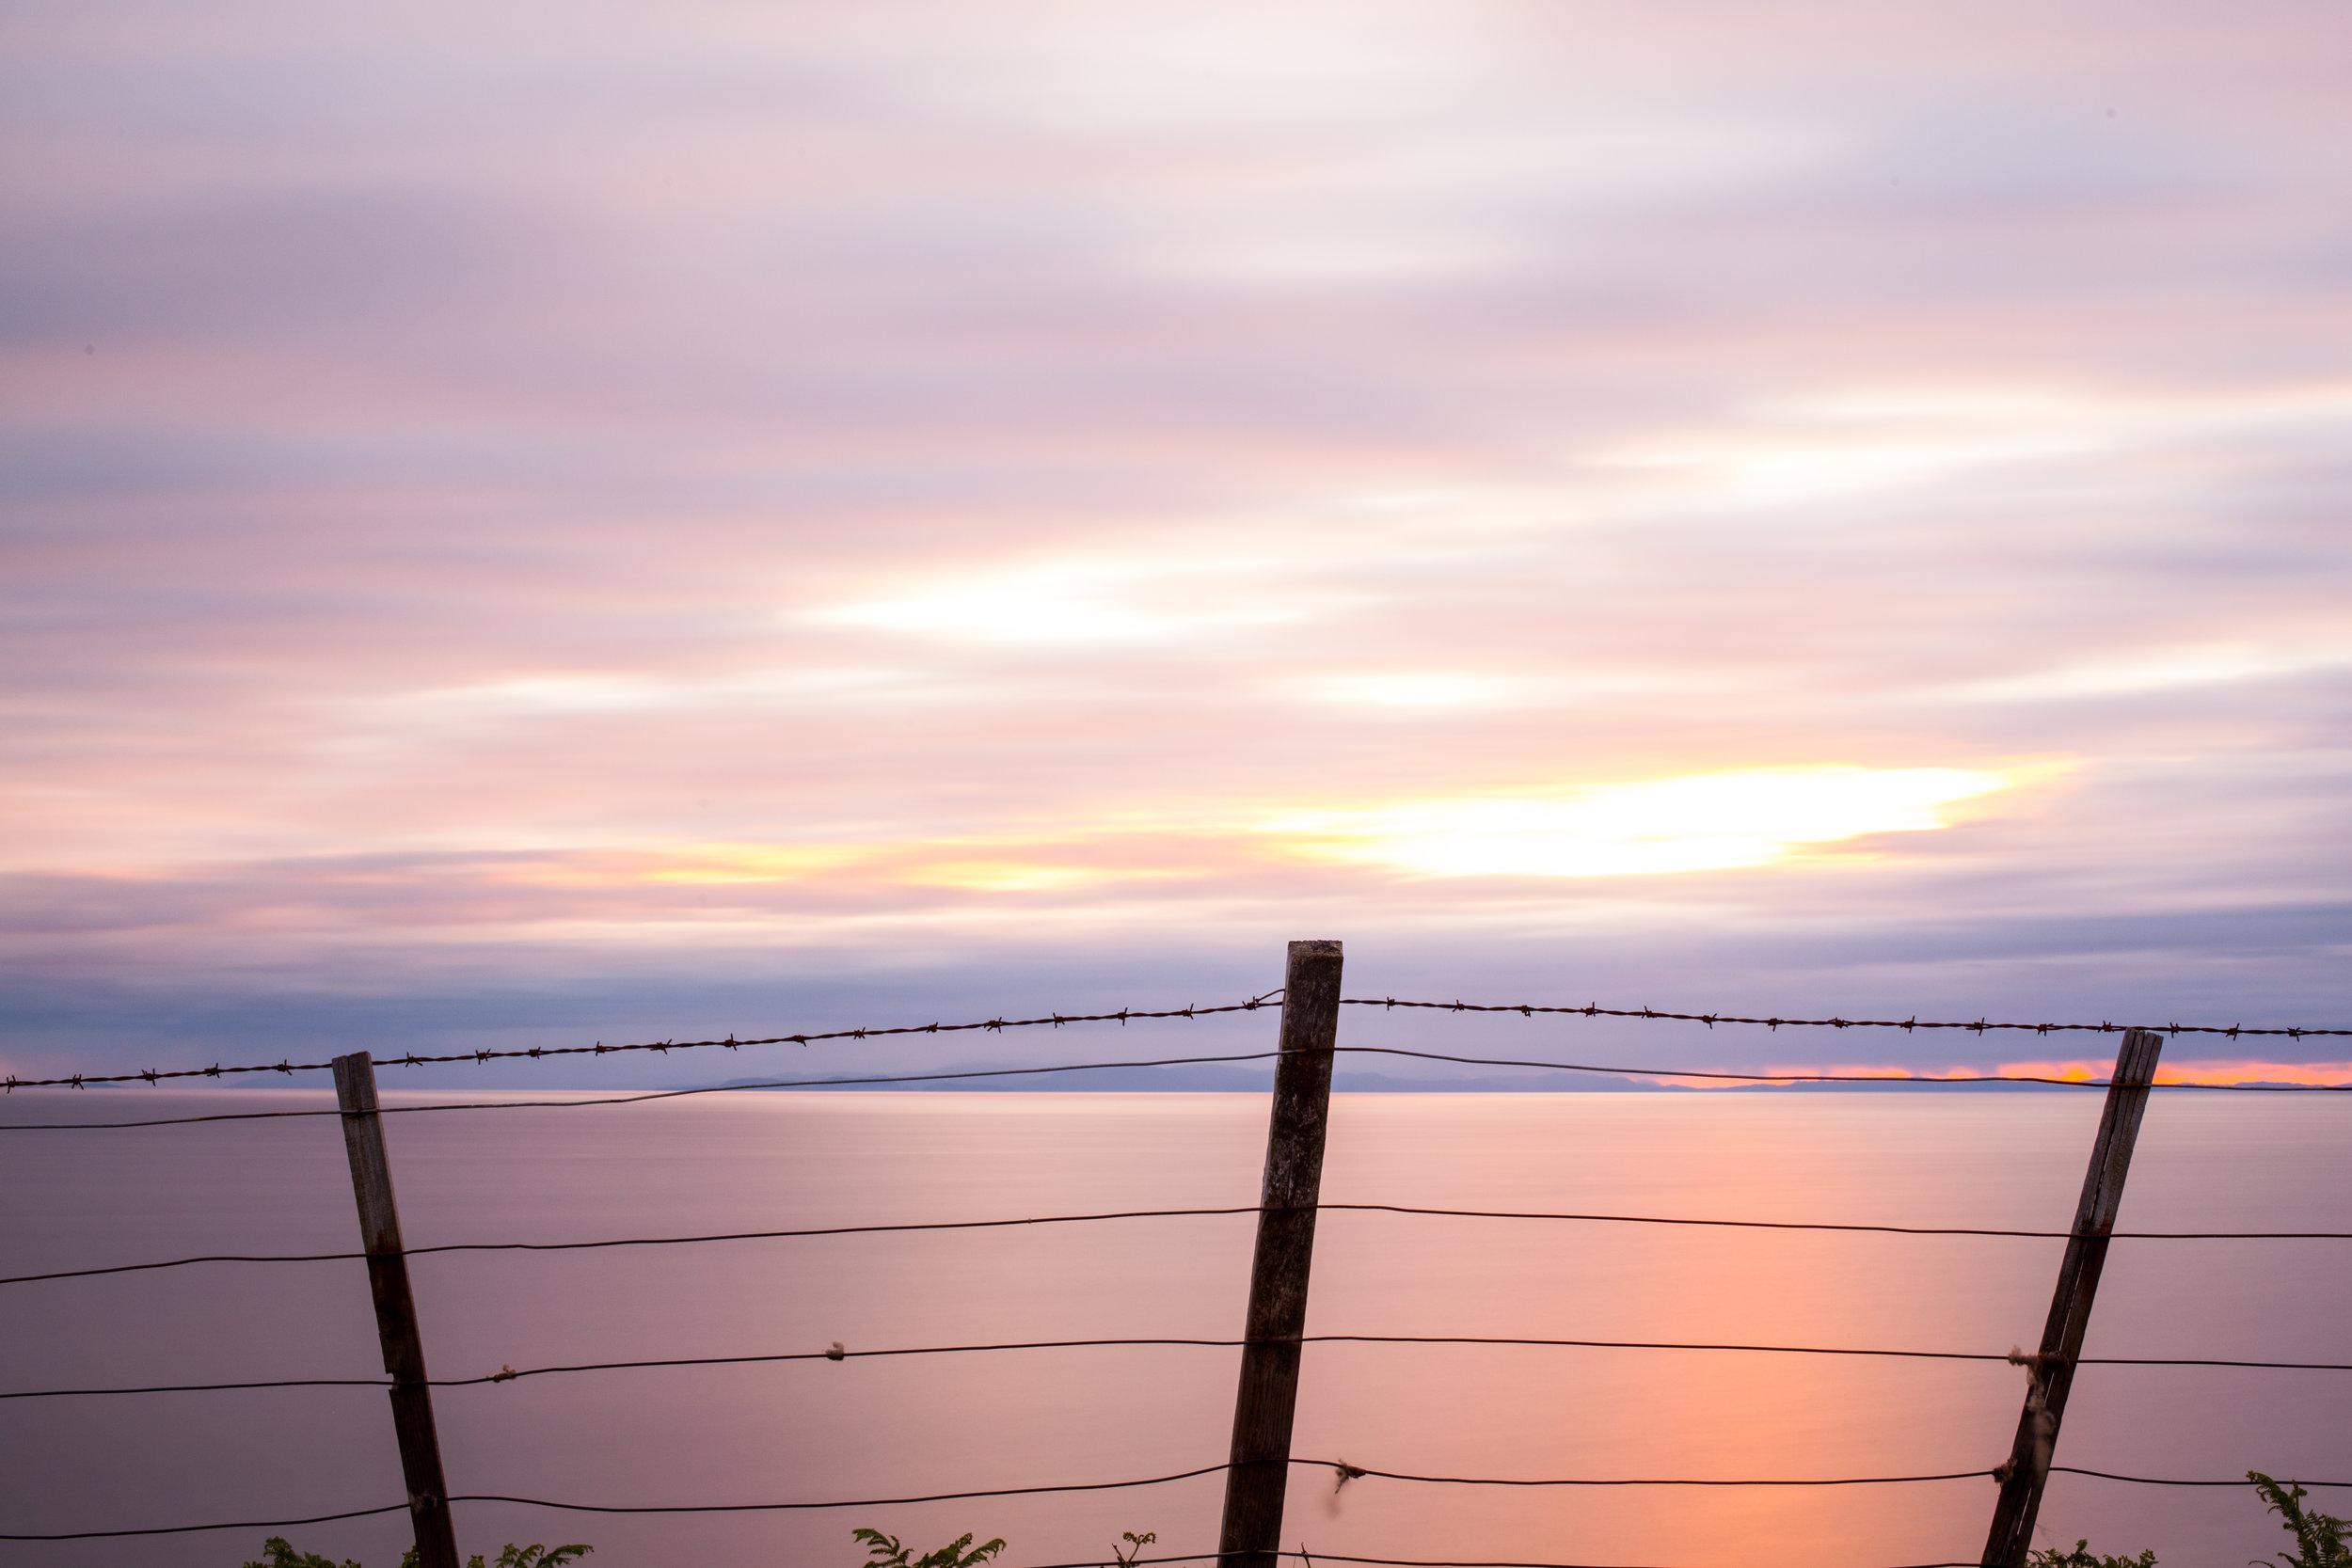 Sunset, Sea, barbed wire, Scotland.